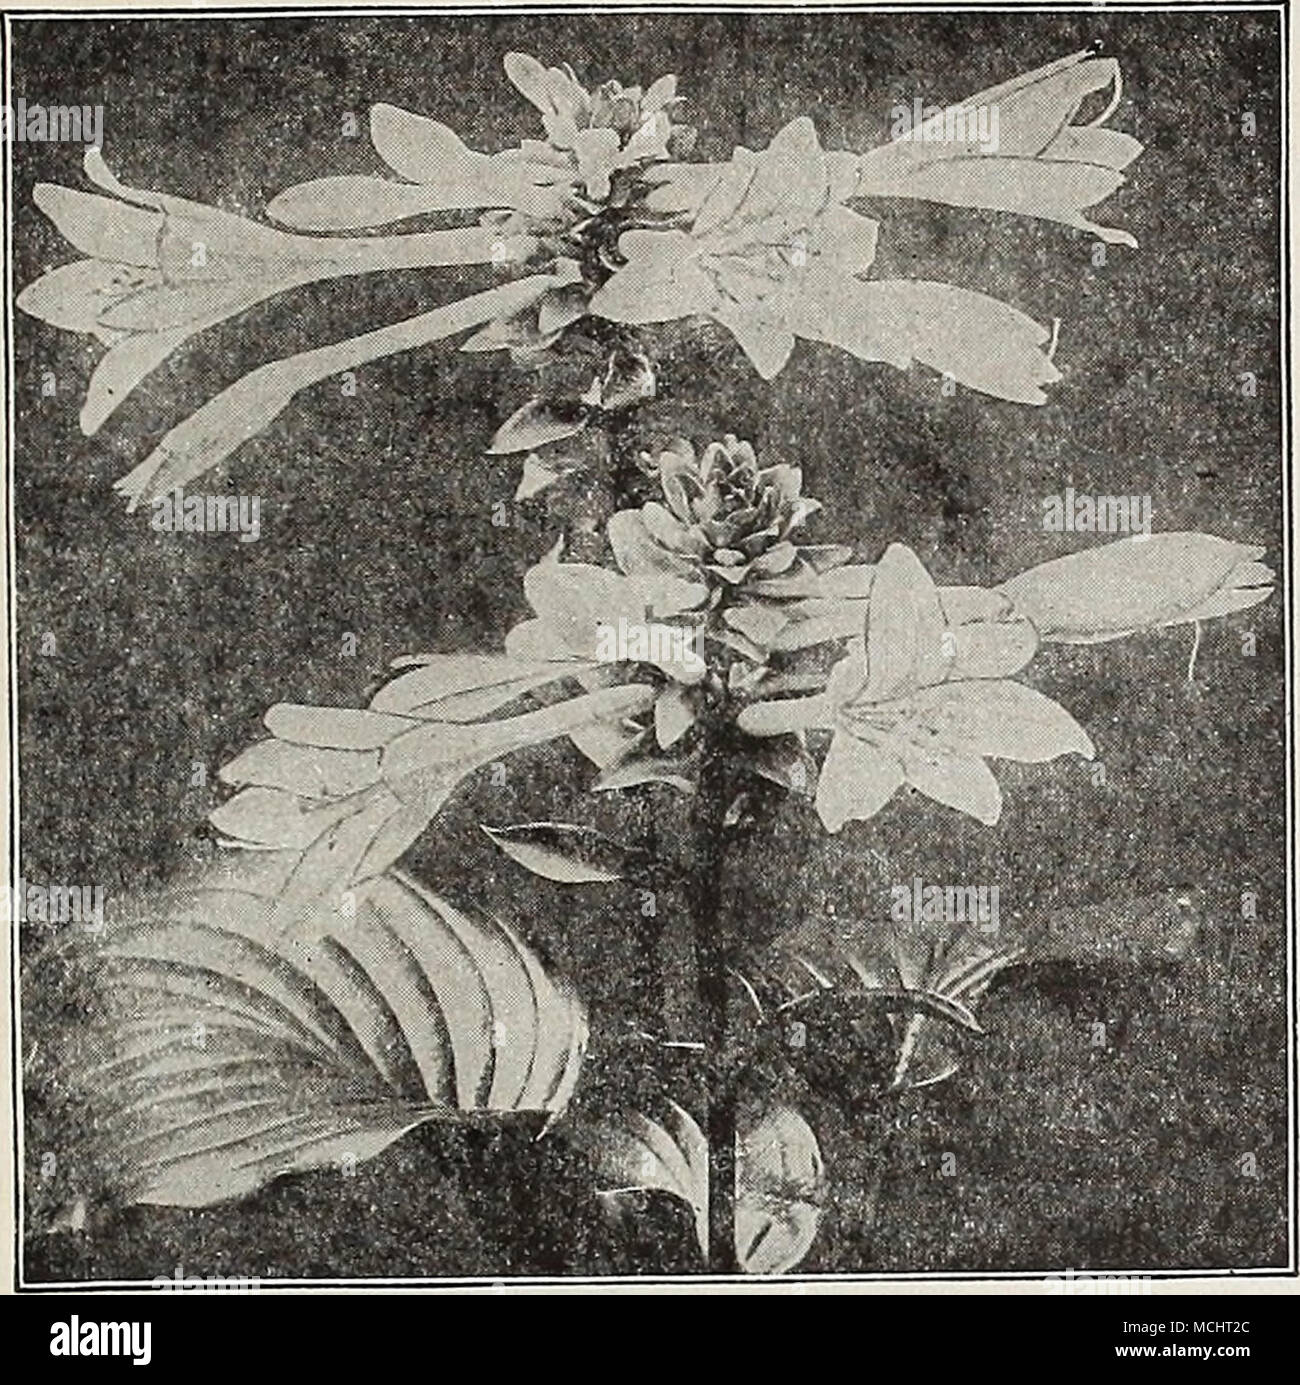 Funkia Sljbcordata Grandiflora Funkia Plantain Lily The Plantain